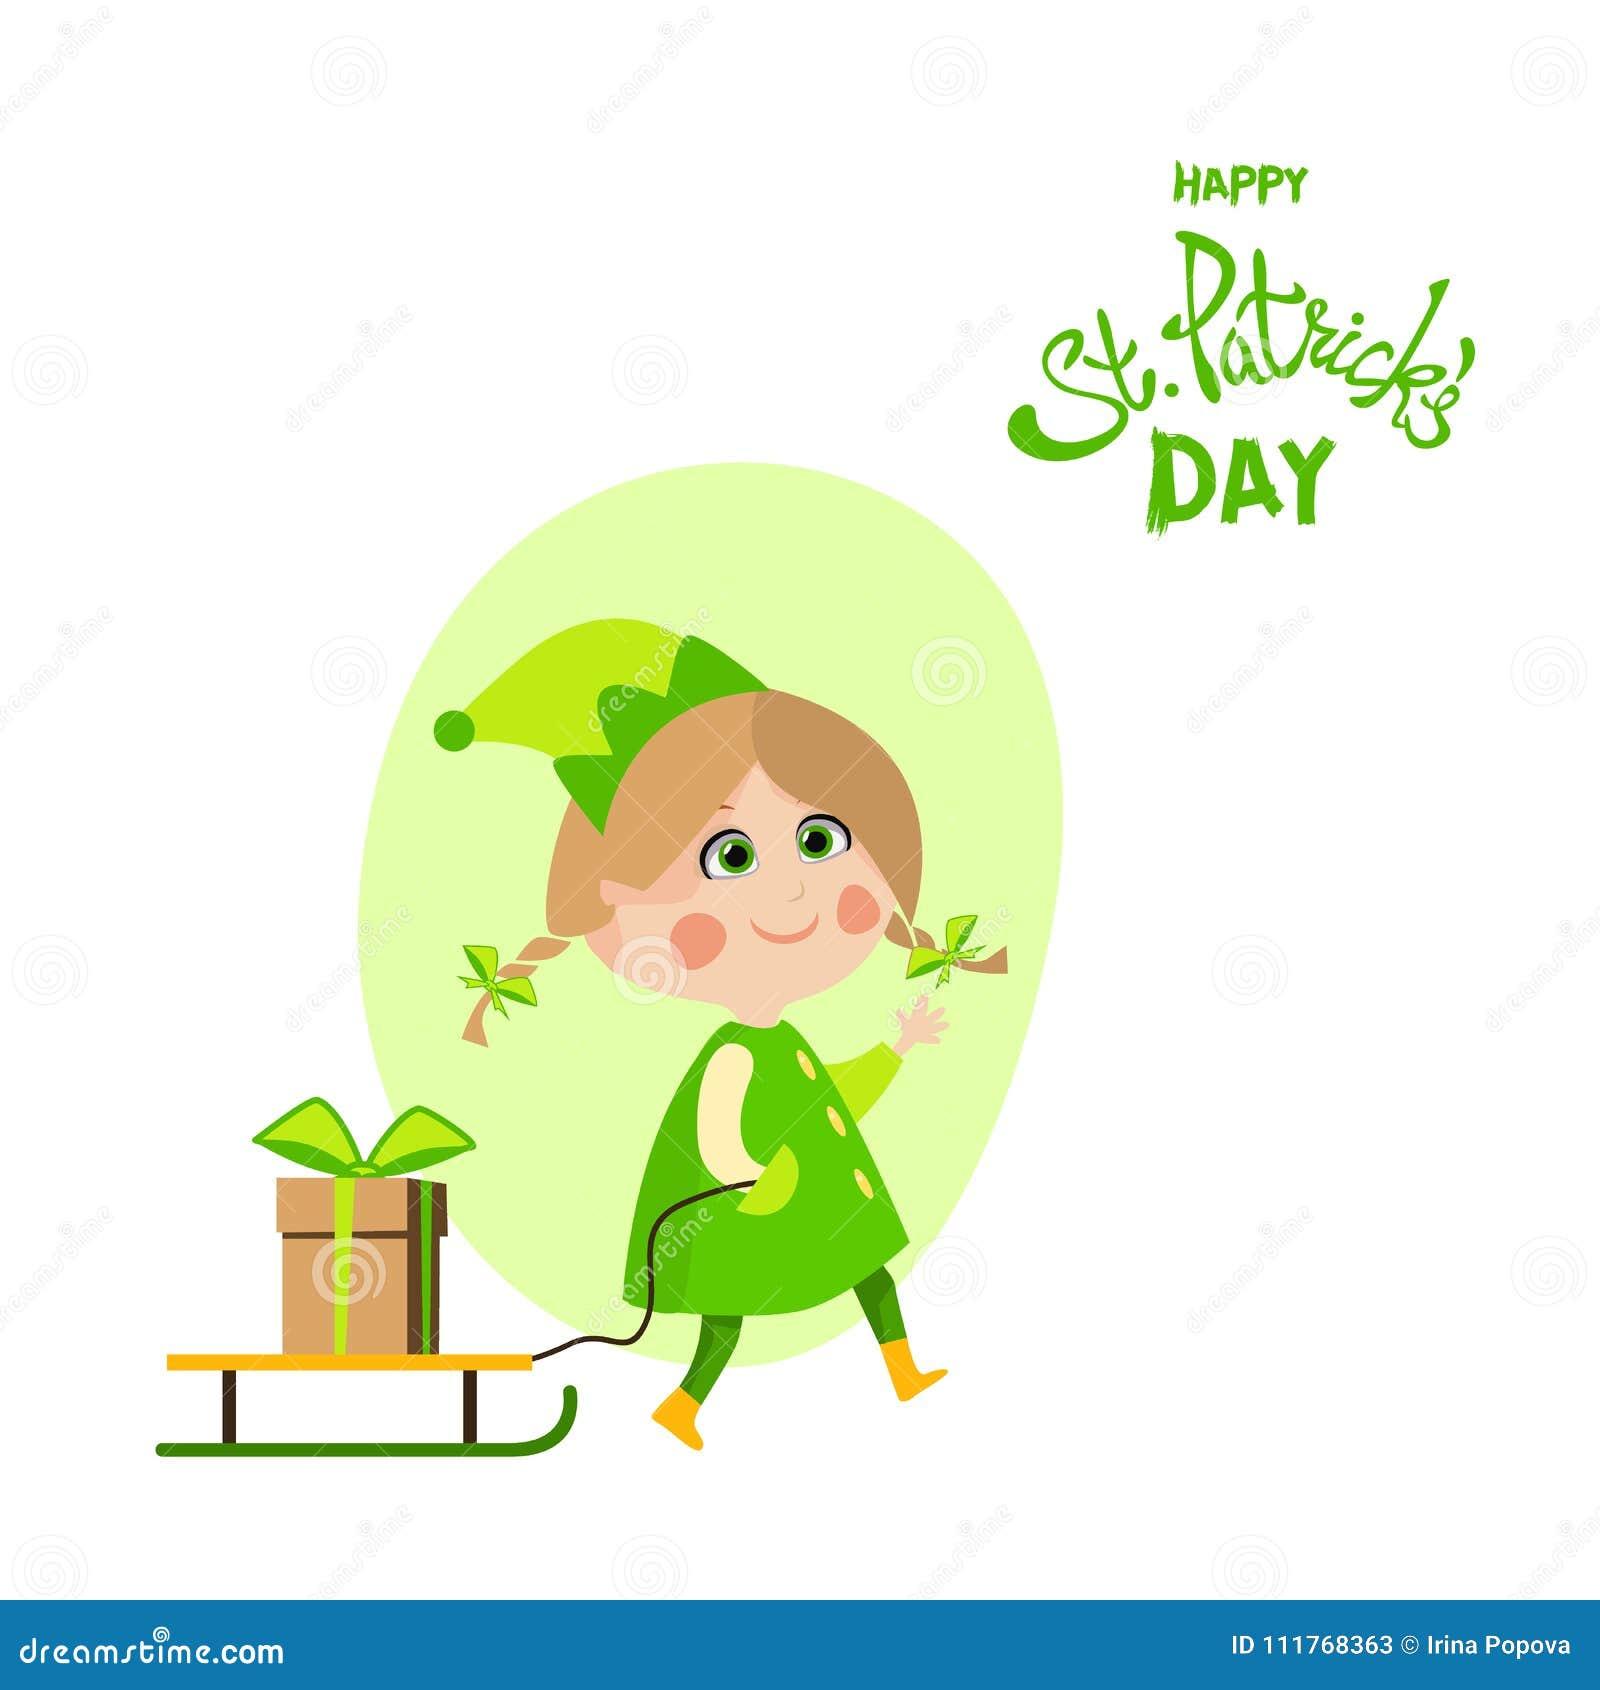 Happy St Patricks Day Greeting Stock Vector Illustration Of